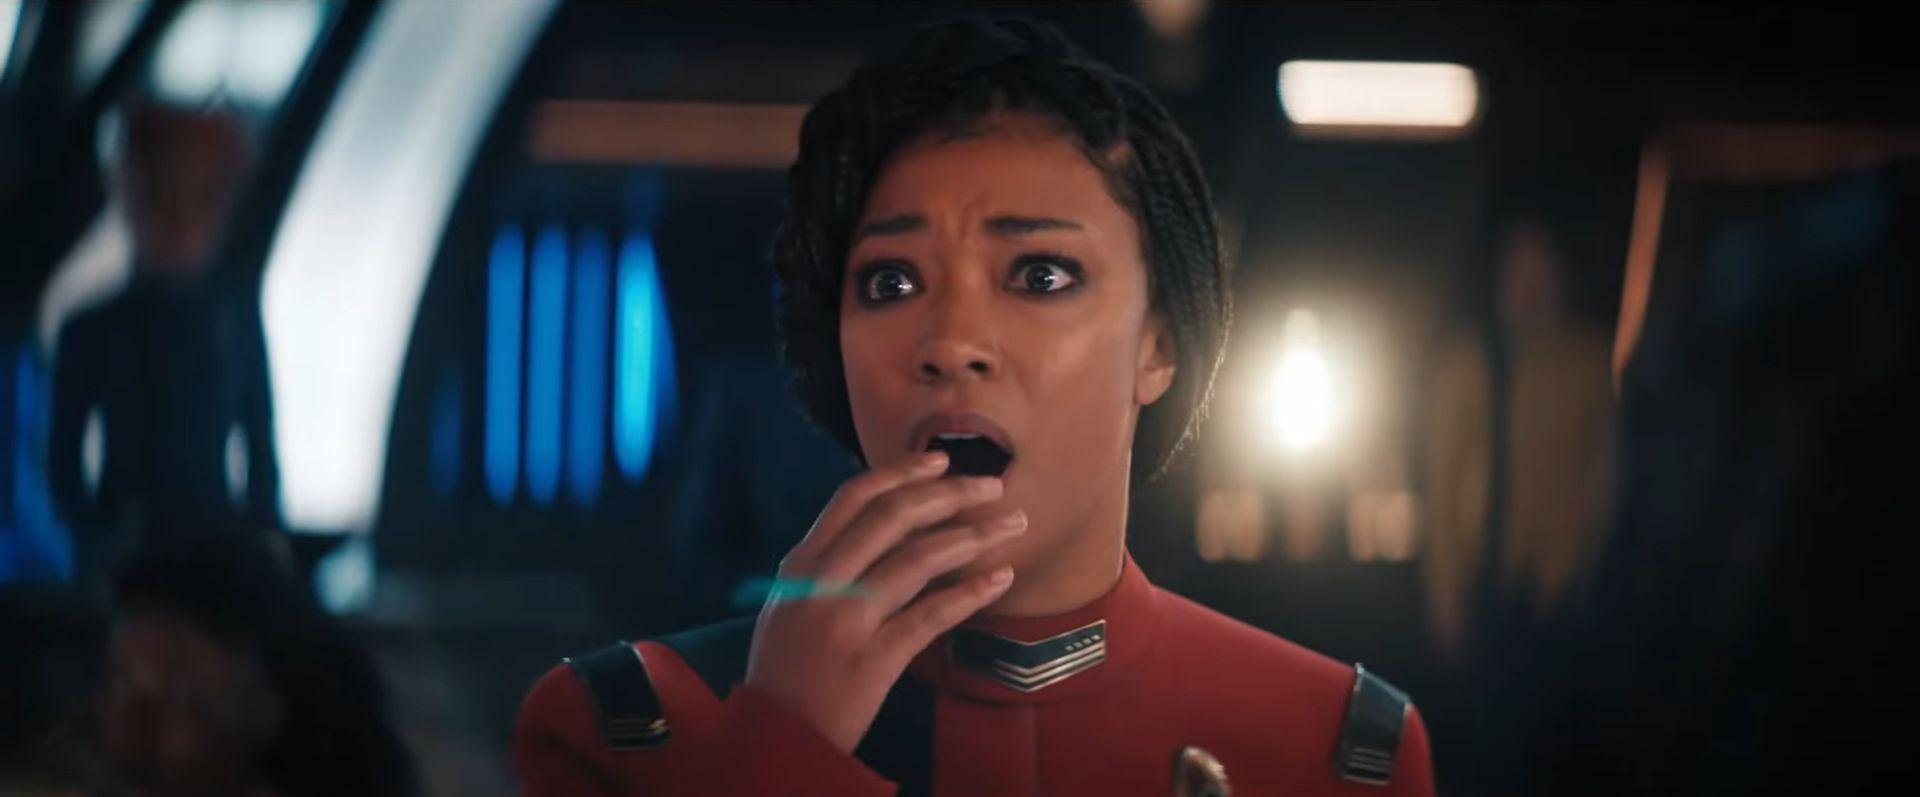 Star Trek Discovery: Season 4 will be released in 2021, trailer released